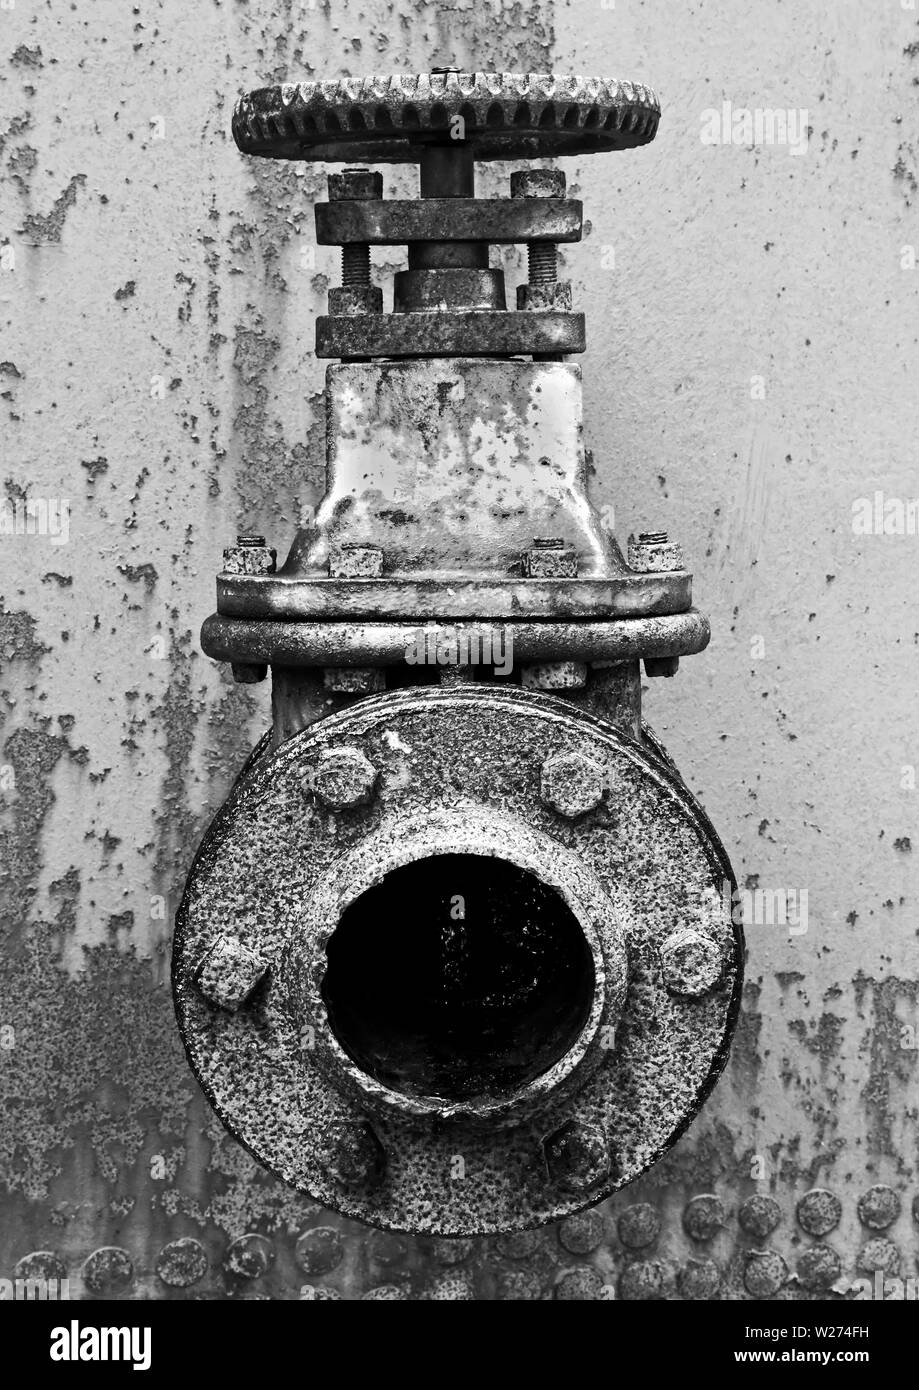 Industrial Relics #3 - Stock Image